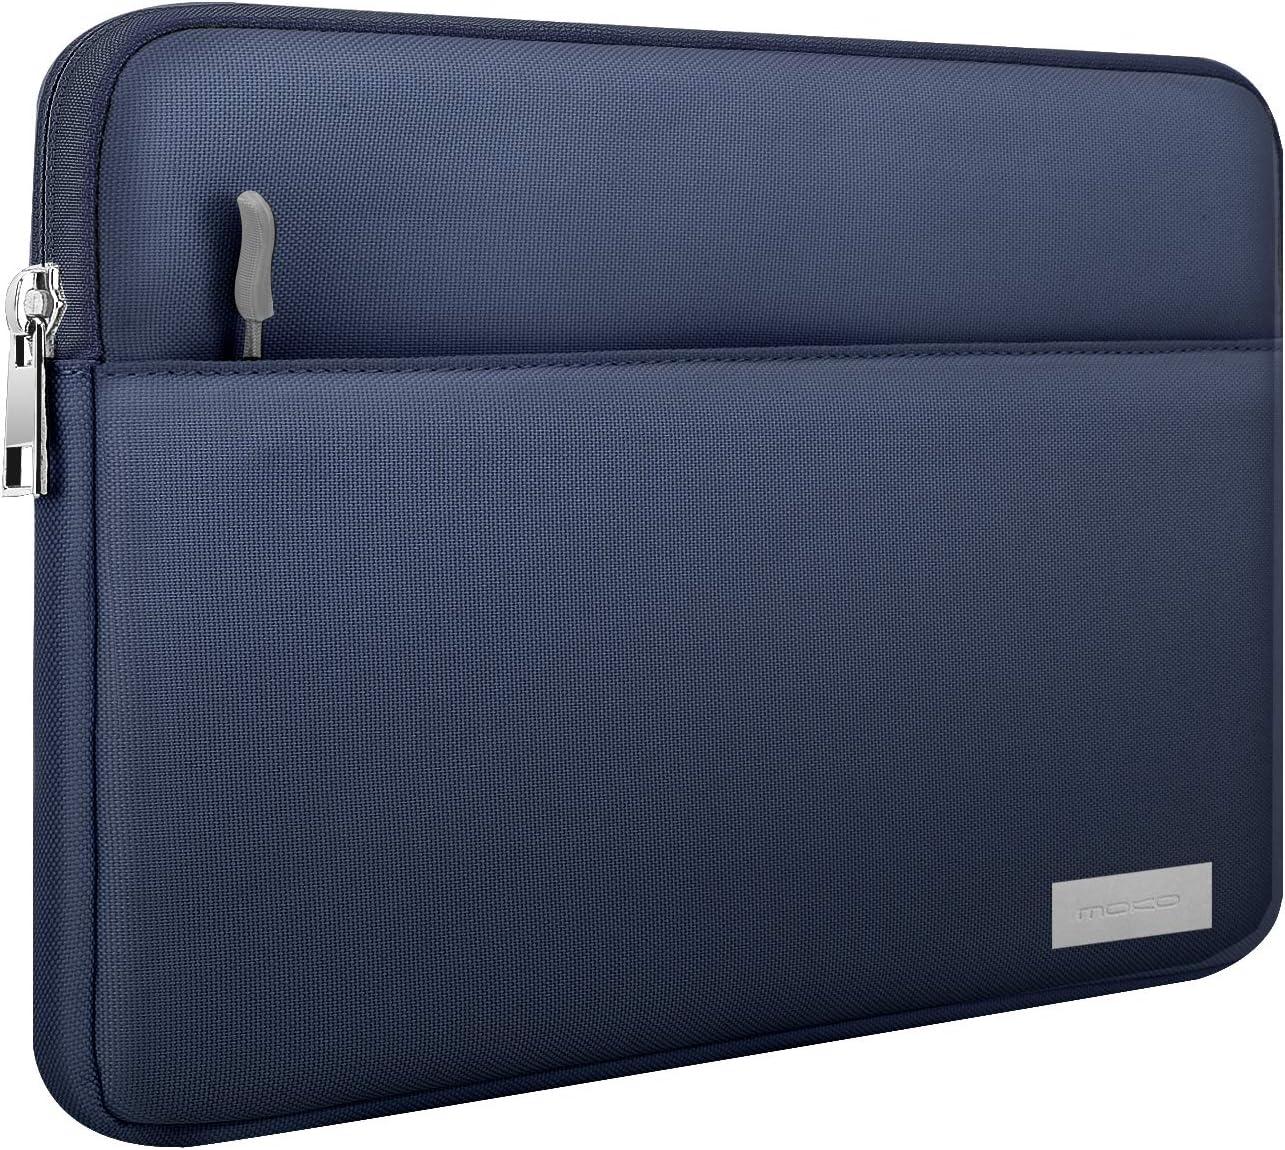 MoKo 11 Inch Tablet Sleeve Bag Carrying Case Fits iPad Pro 11, iPad 8th 7th Generation 10.2, iPad Air 4 10.9, iPad Air 3 10.5, iPad 9.7, Galaxy Tab A 10.1, Tab S6, S6 Lite, Tab S7, Fit Smart Keyboard